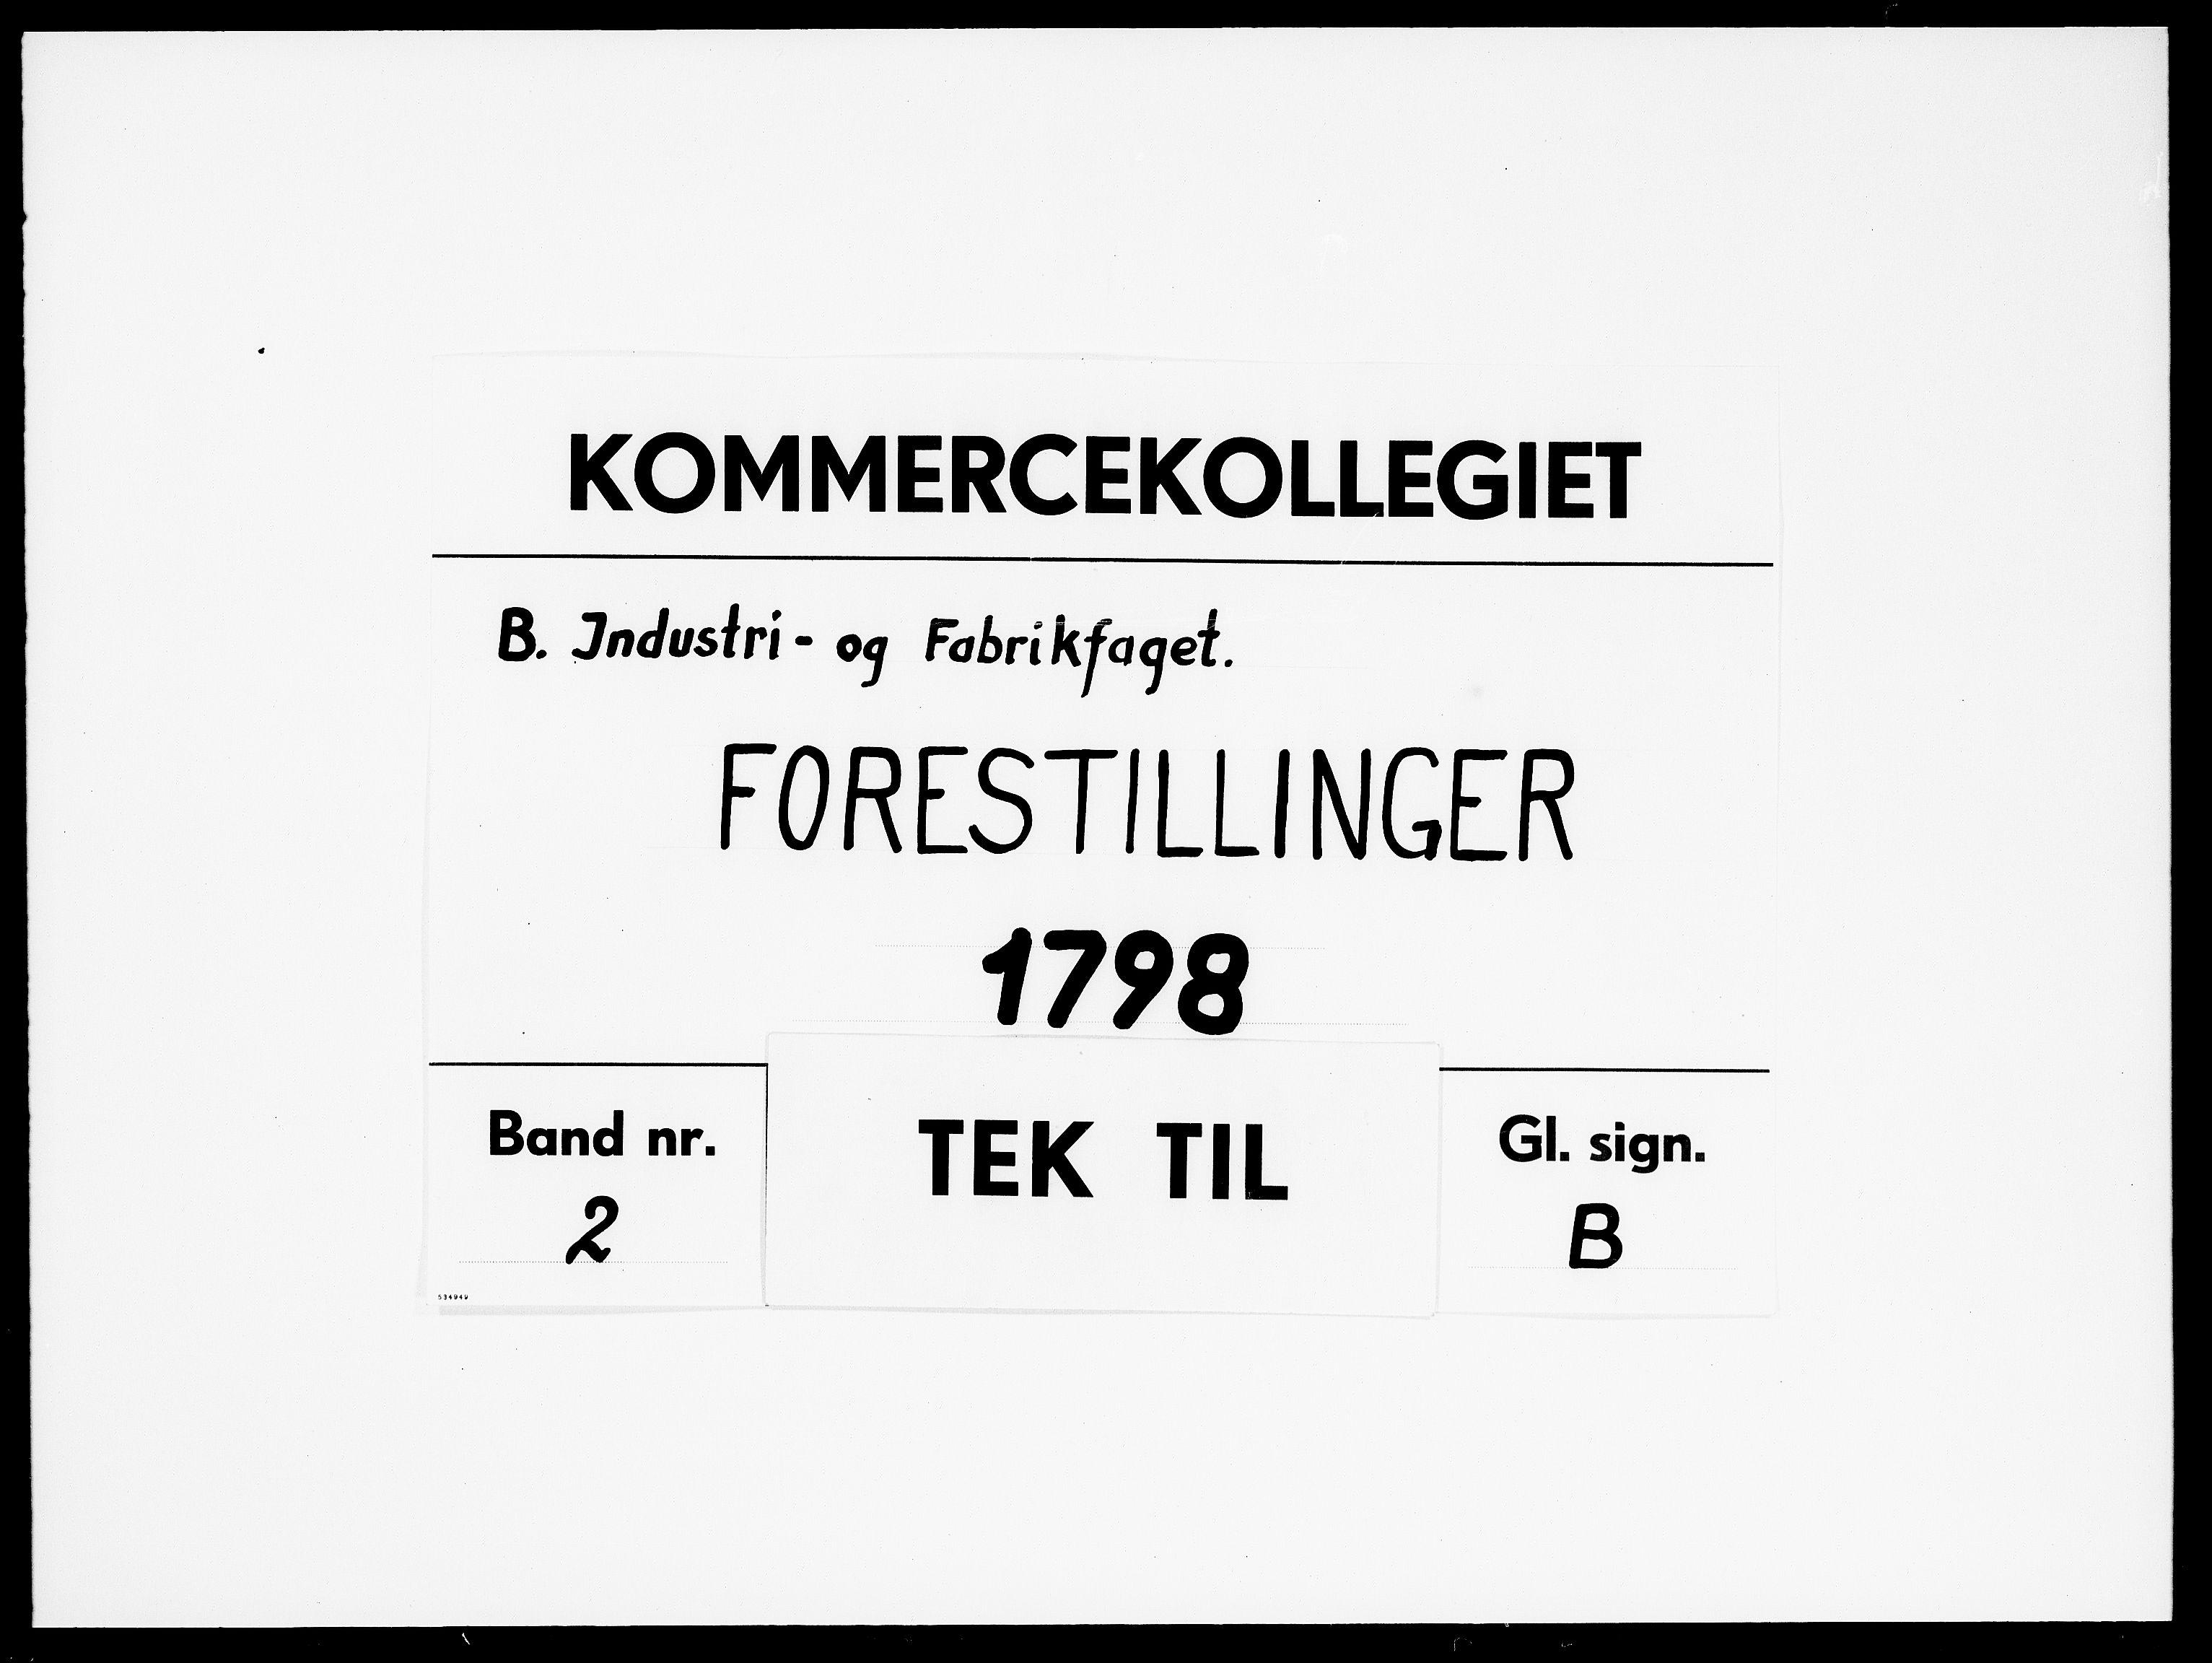 DRA, Kommercekollegiet, Industri- og Fabriksfaget, -/1338: Forestillinger, 1798